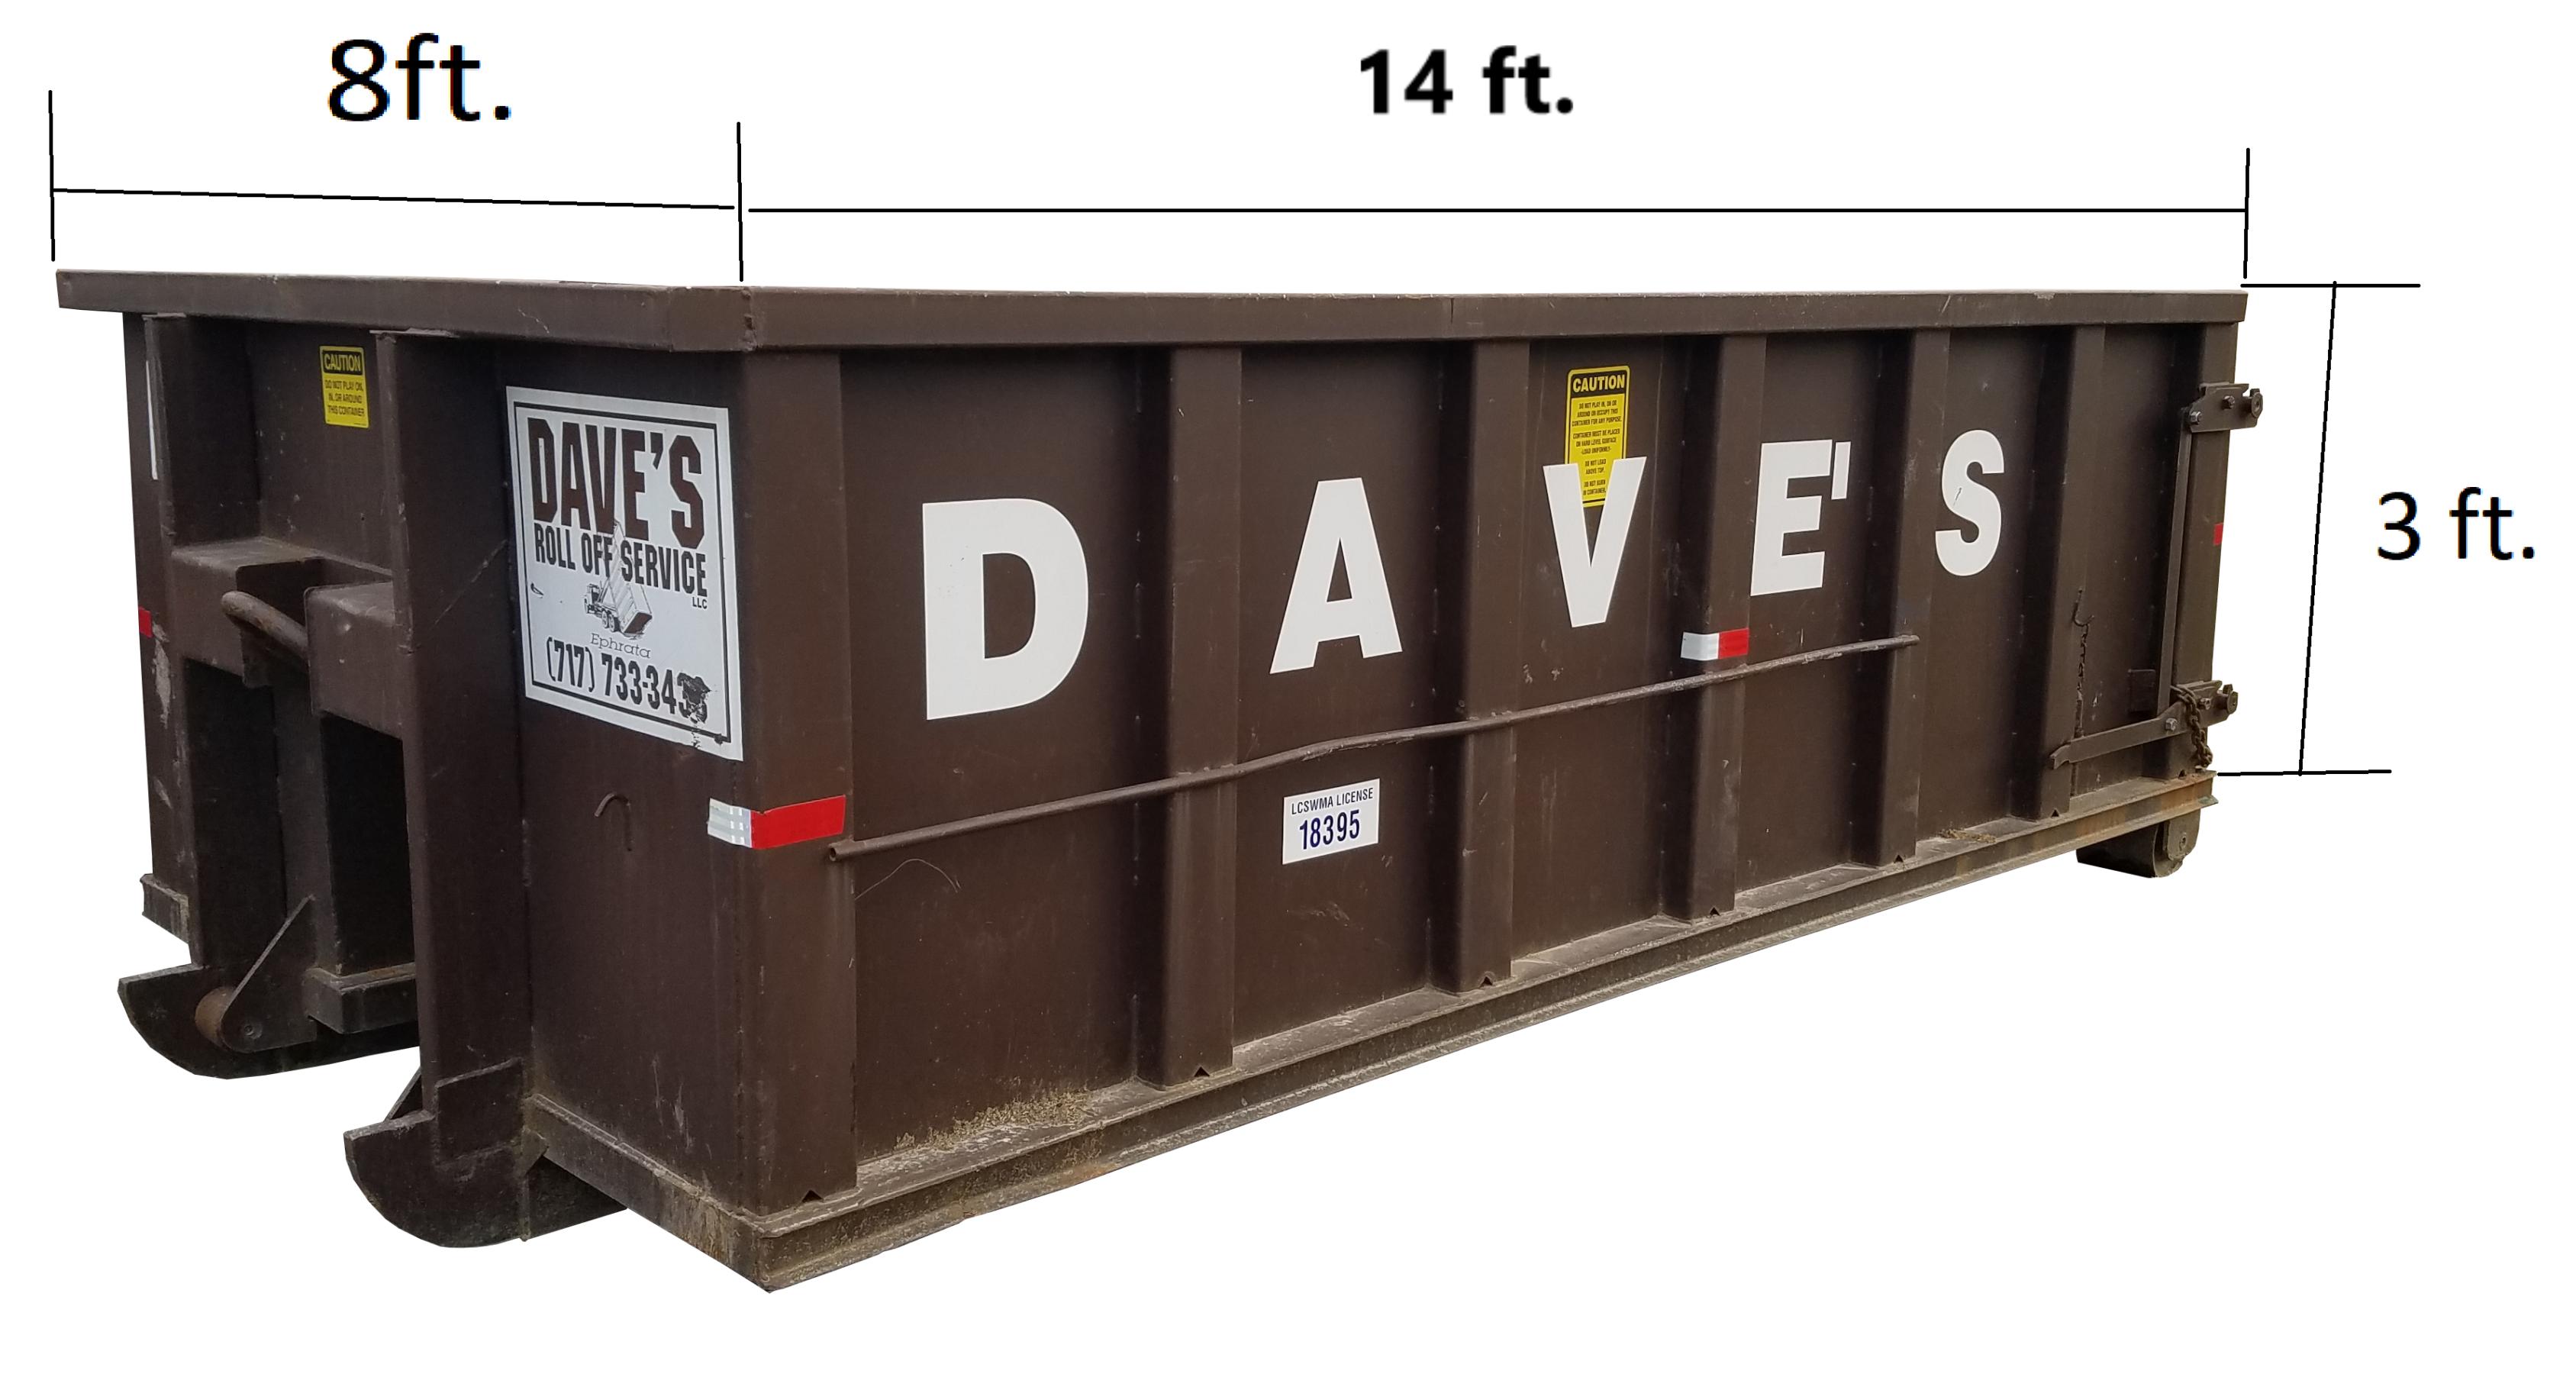 15 yd. dumpster